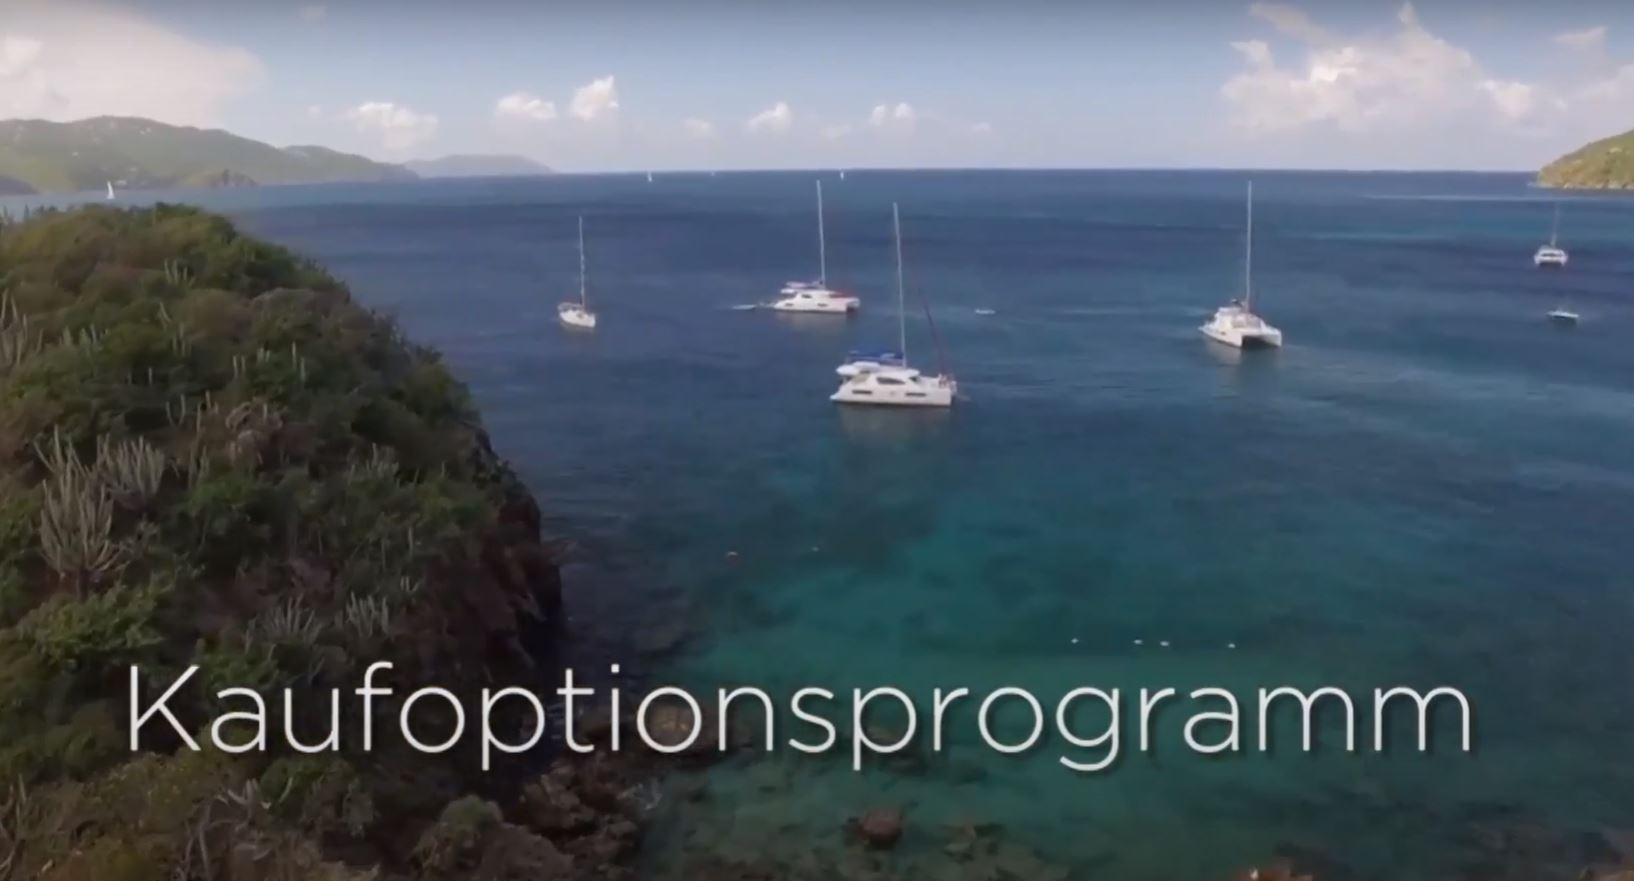 Sunsail - Yachteignerprogramm 2017